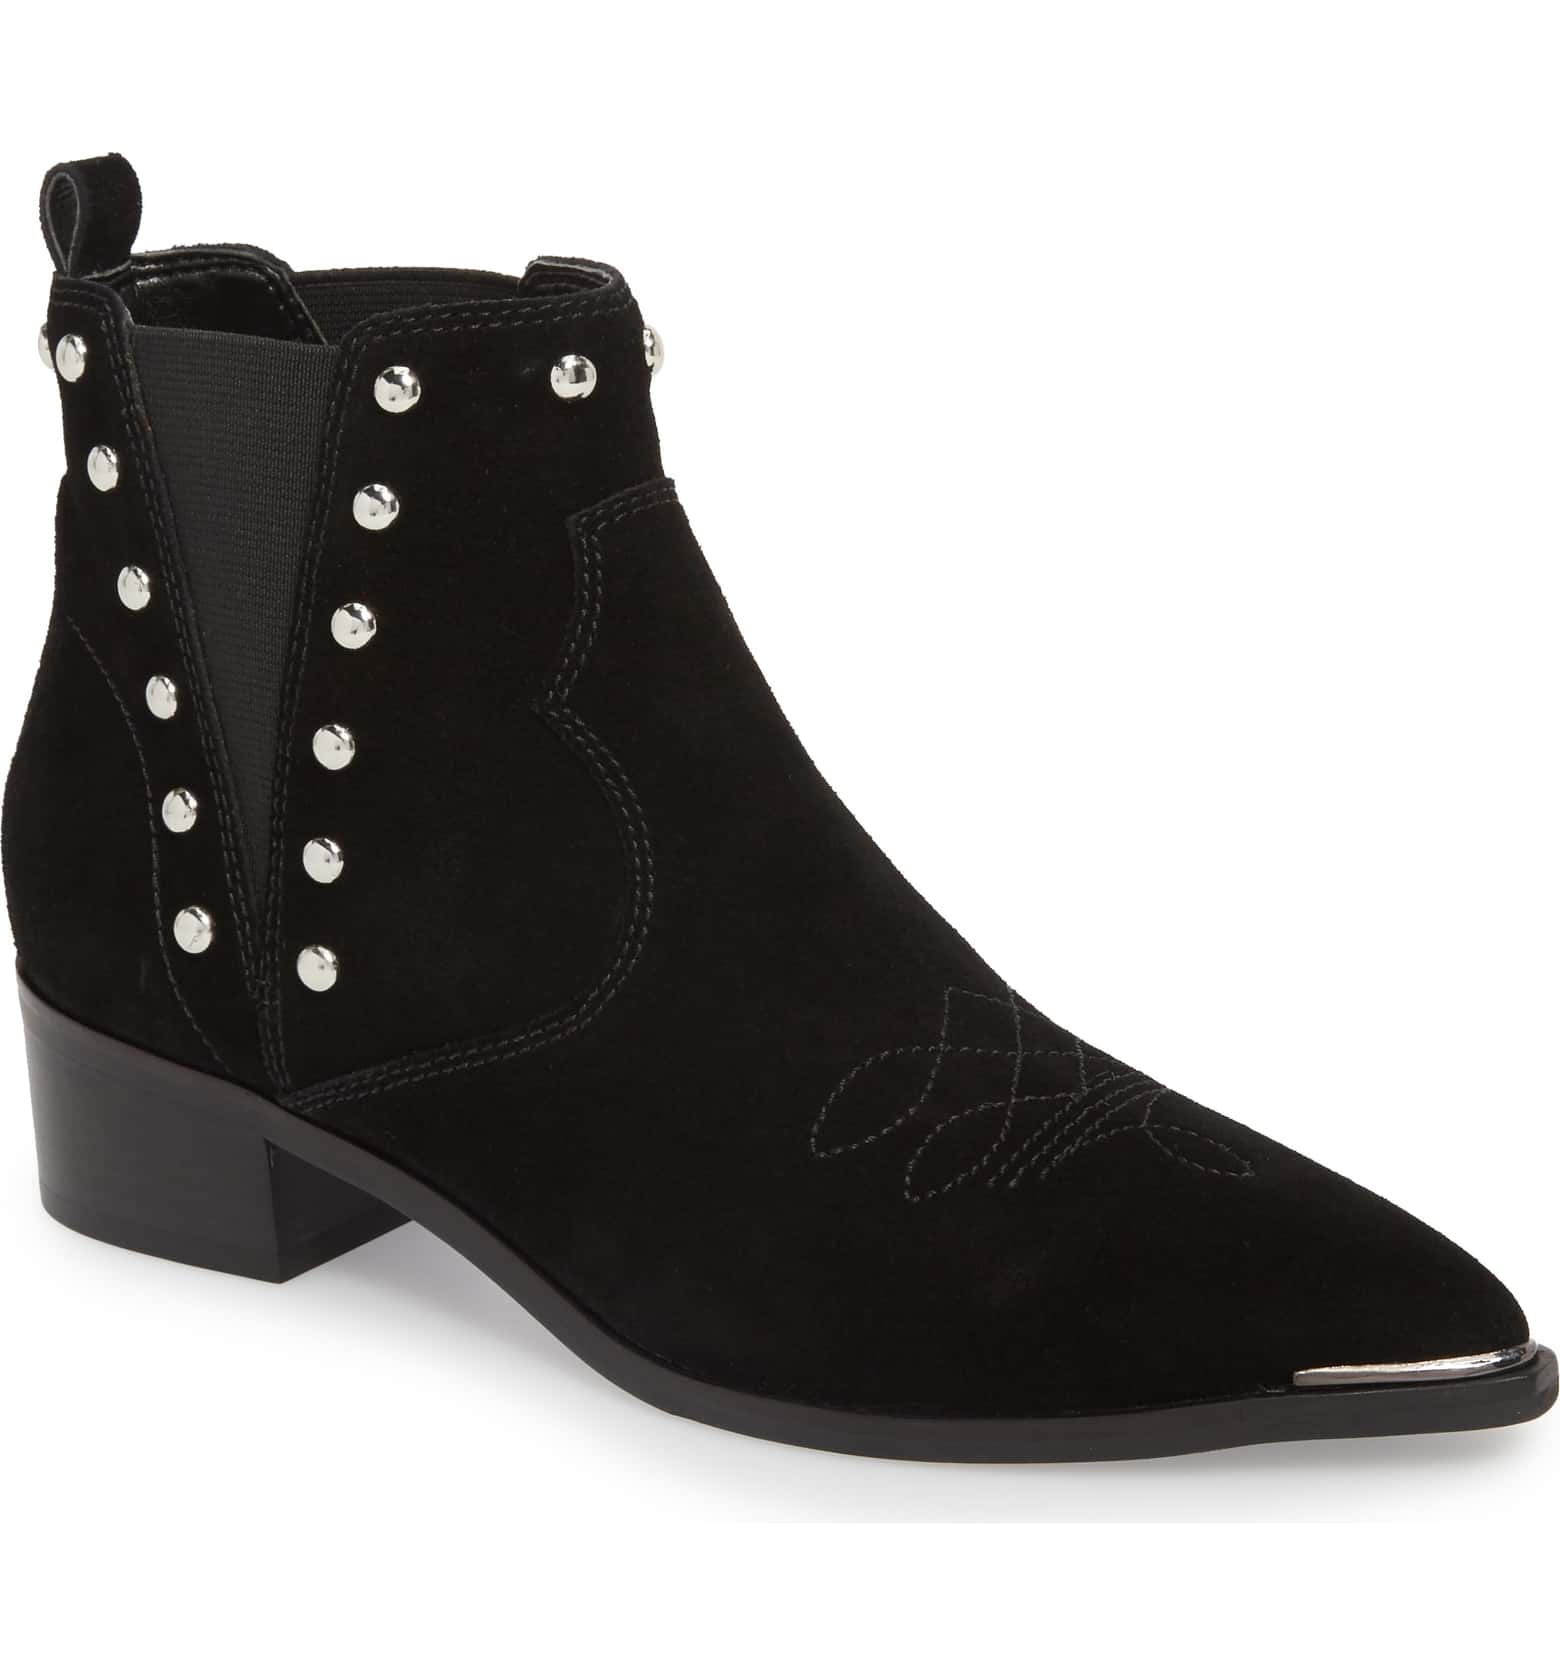 MF Yente Chelsea Boot $119